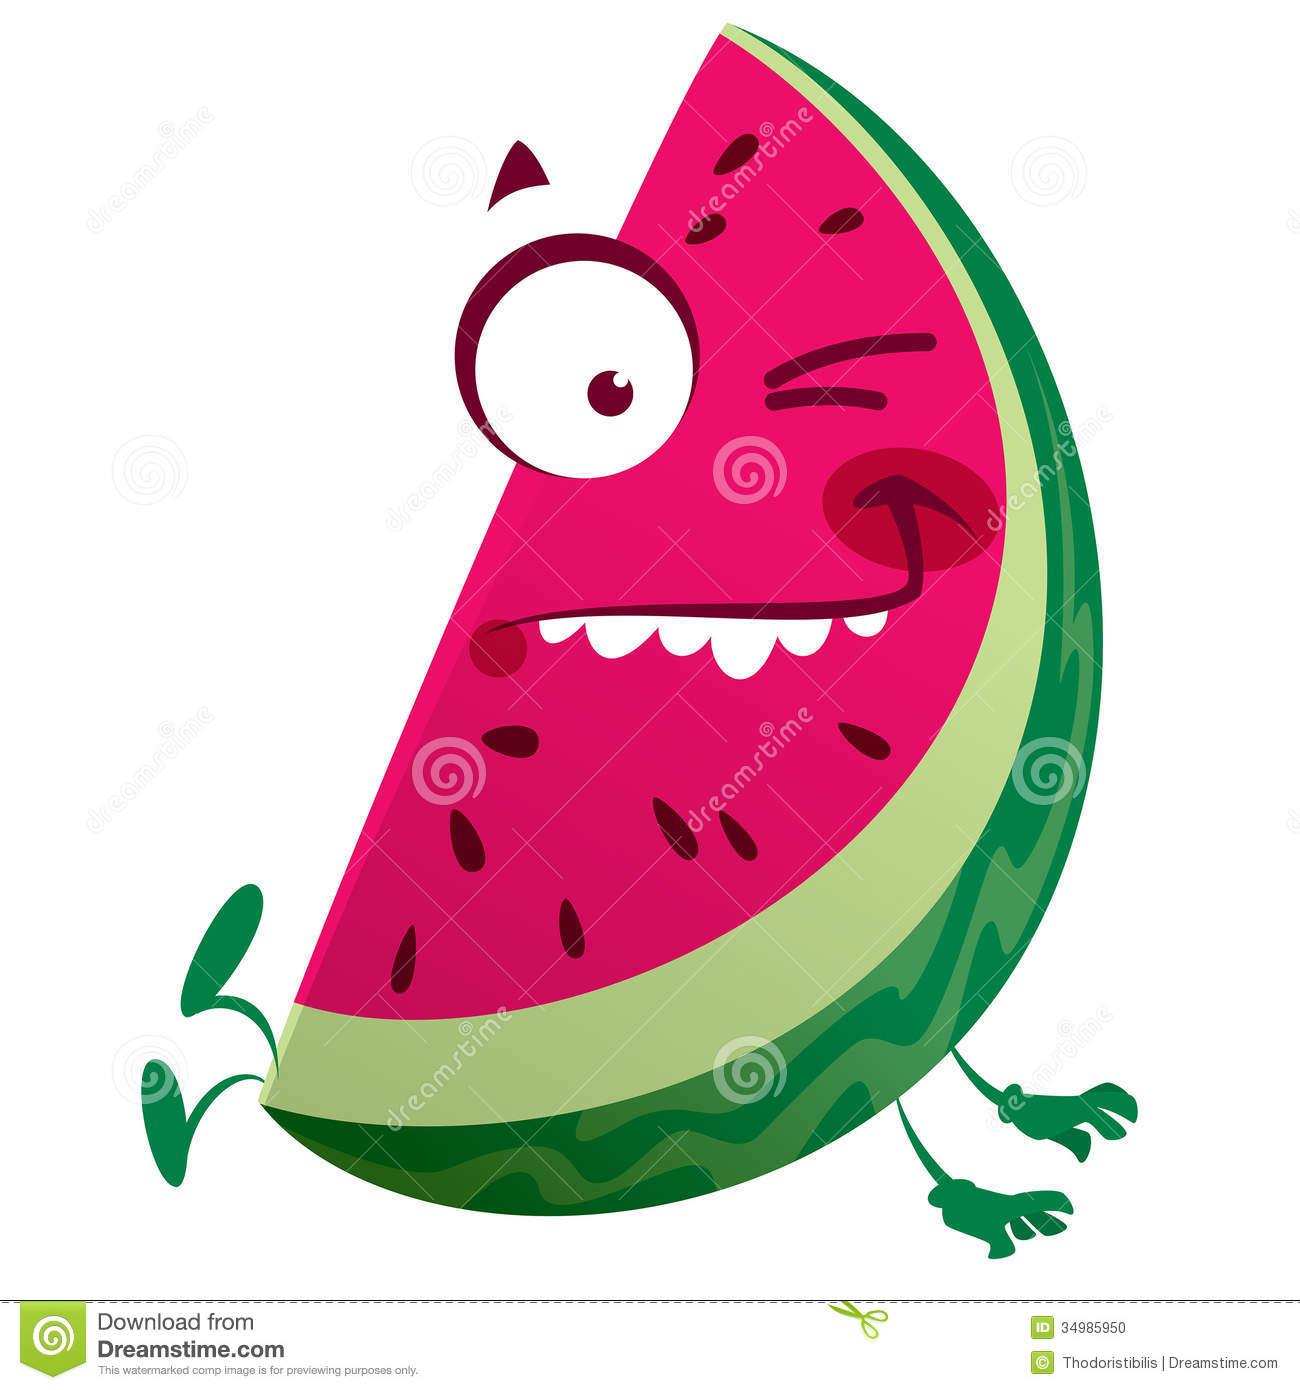 cute-watermelon-background-cartoon-pink-watermelon-fruit-character    Watermelon Cartoon Characters